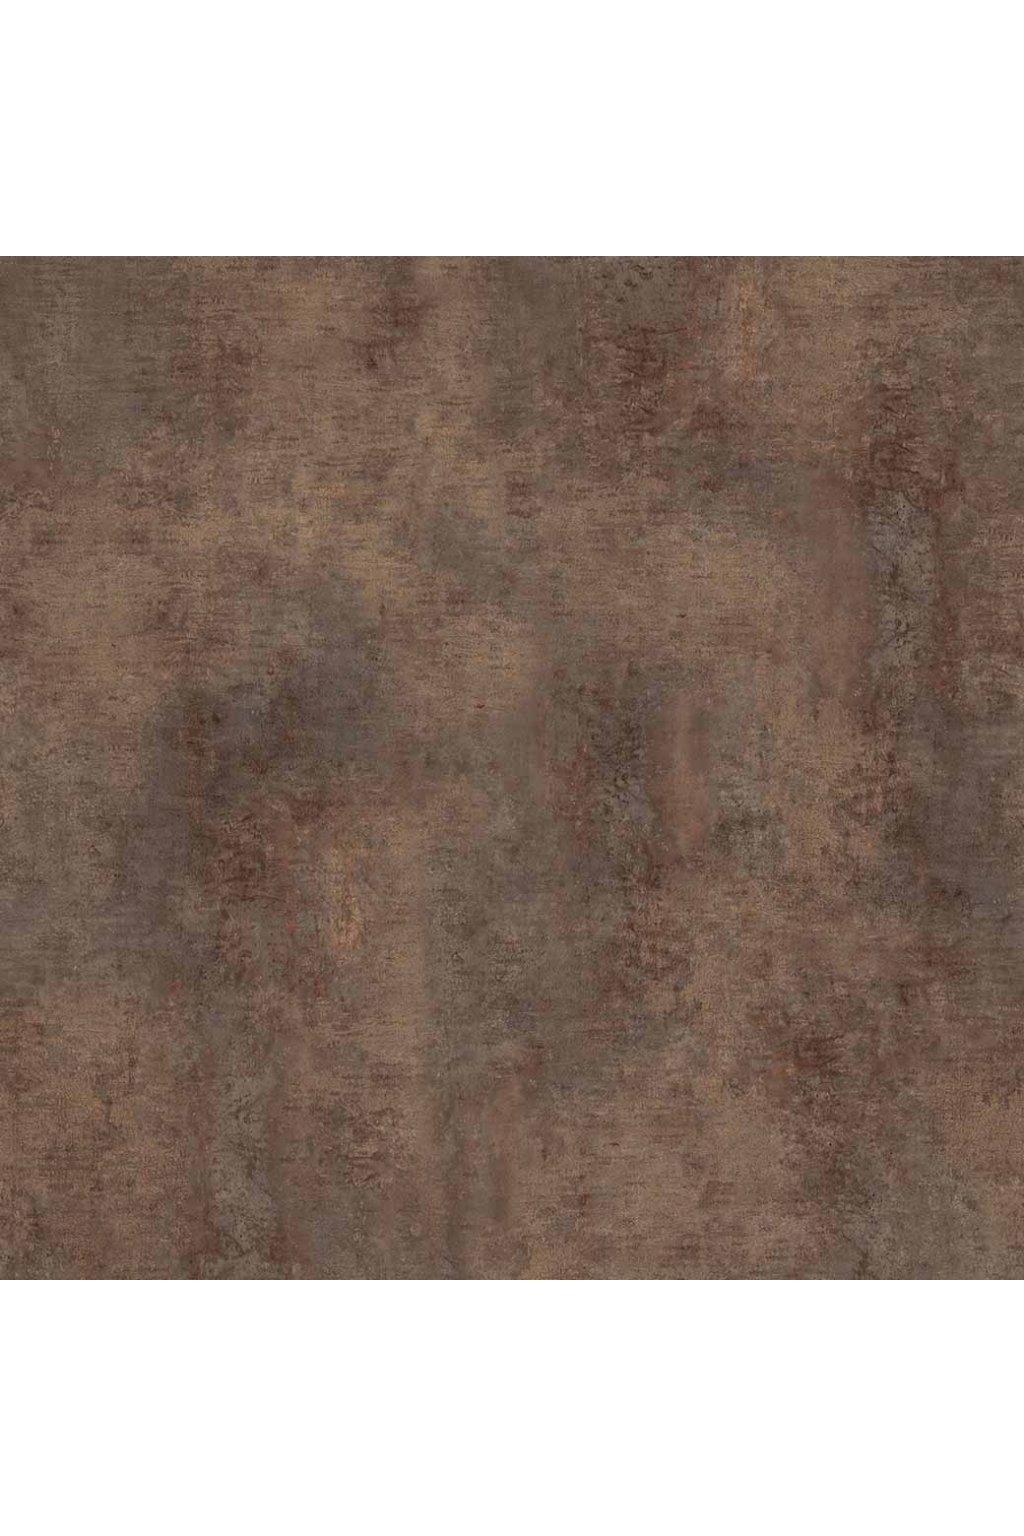 Hrany - ABS - 43x1,5 Rust